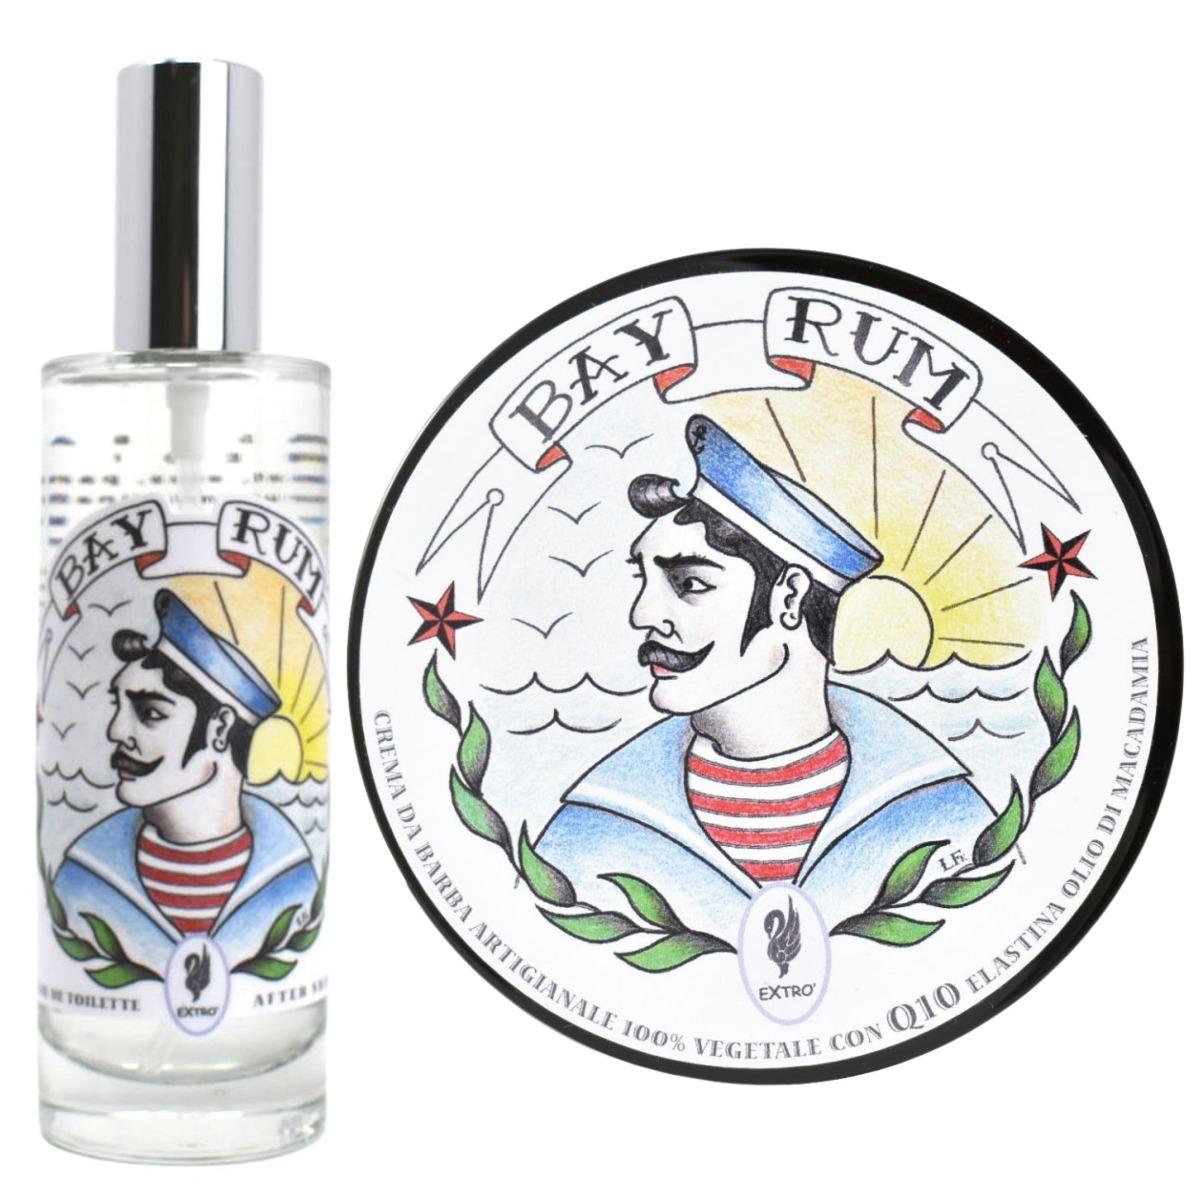 Extro Cosmesi Bay Rum Shaving Cream & Aftershave Set